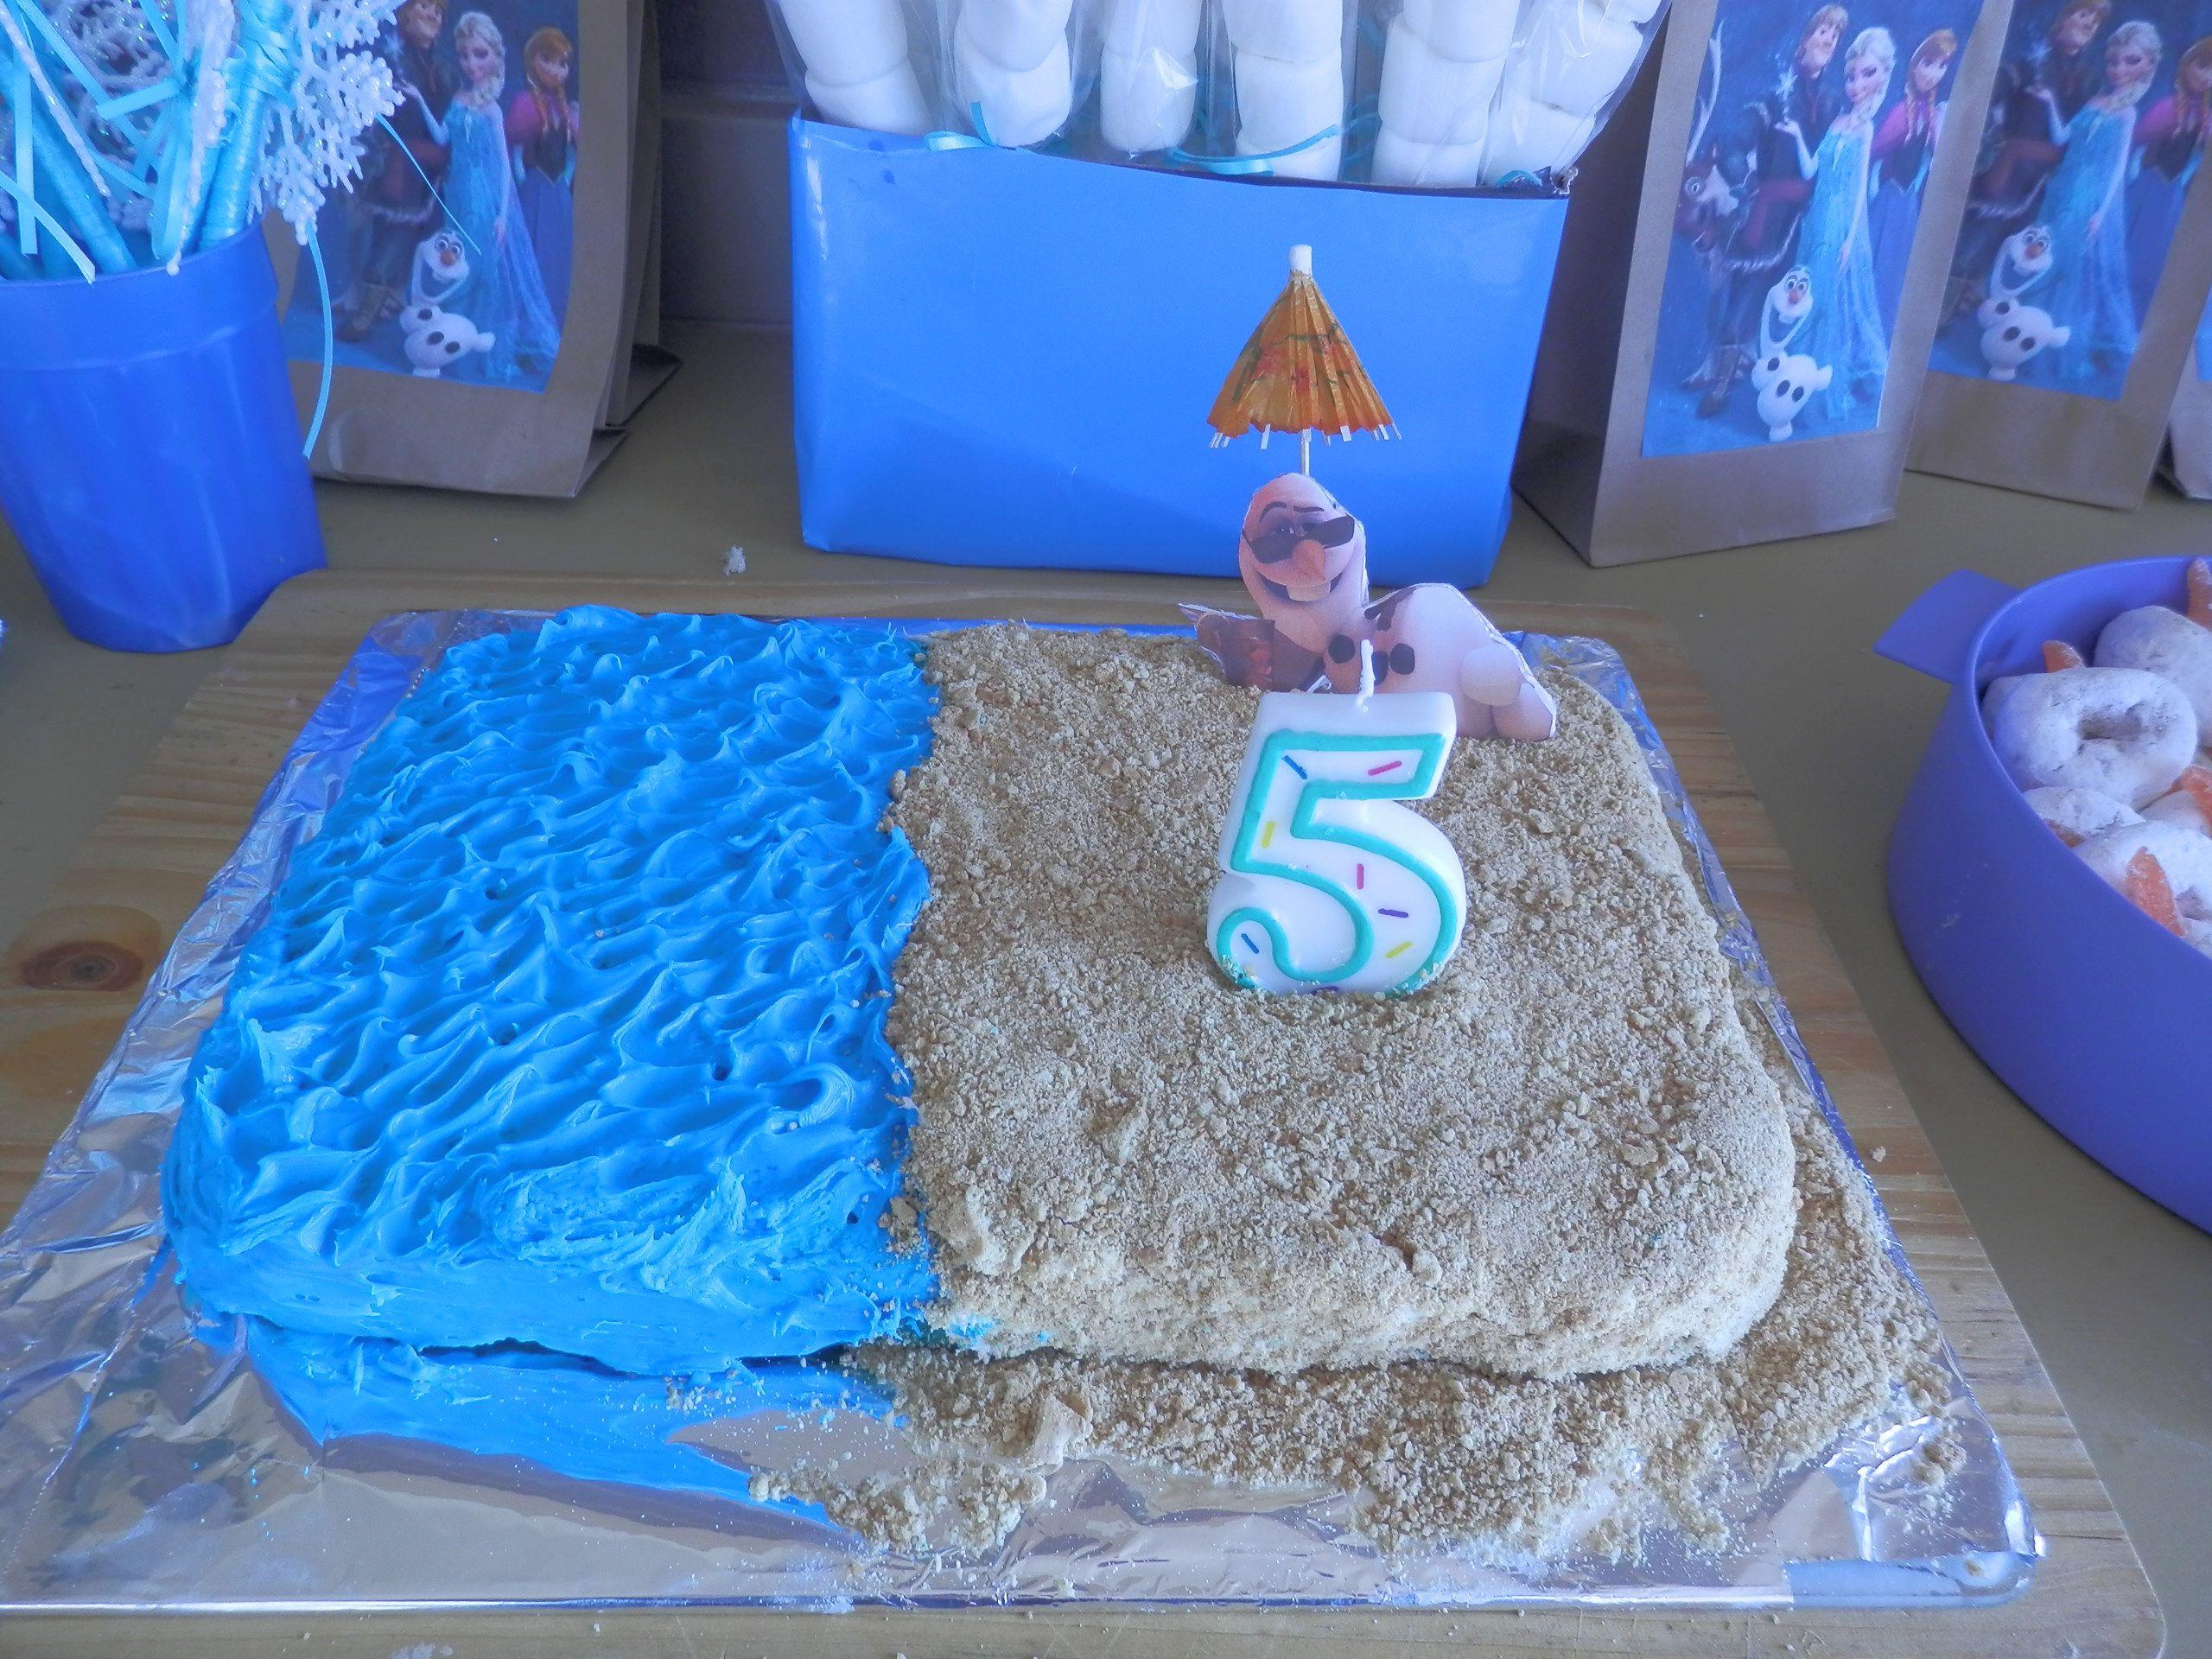 Disney S Frozen Themed Party Food Ideas